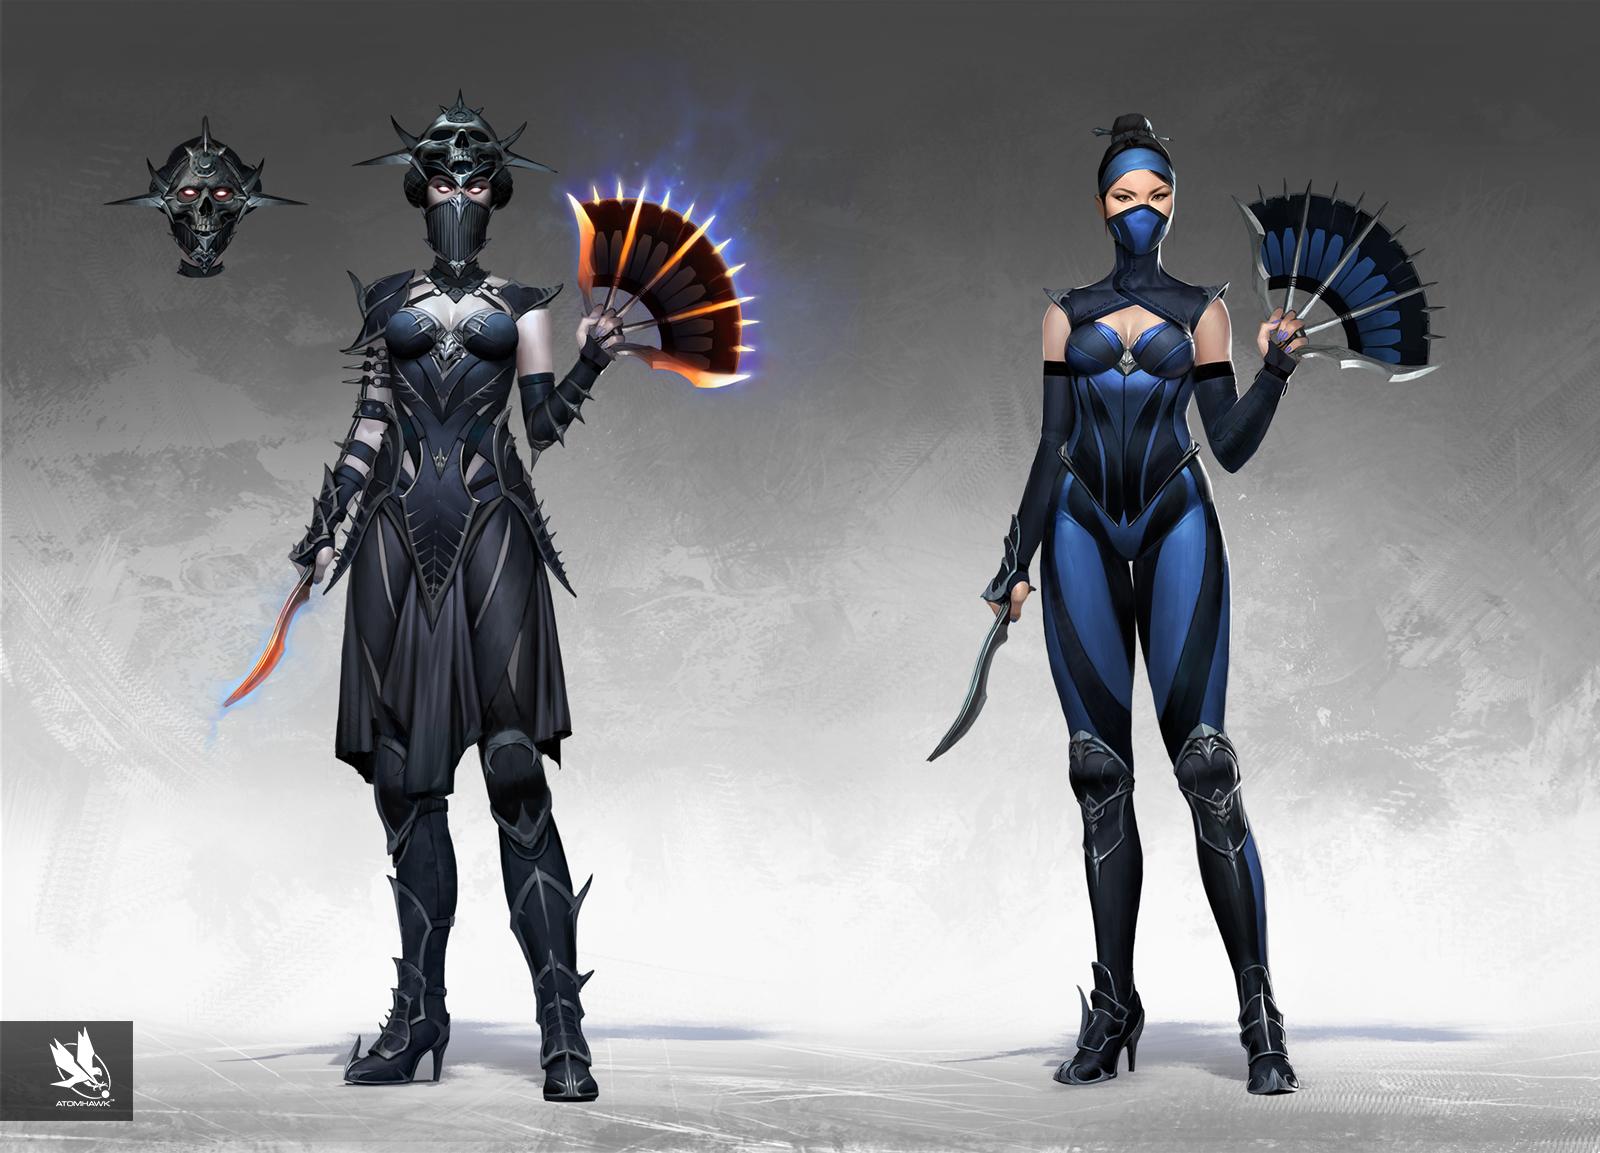 Atomhawk_Warner-Bros-NetherRealm_Mortal-Kombat-11_Concept-Art_Character-Design_Side-by-Side_Kitana.jpg